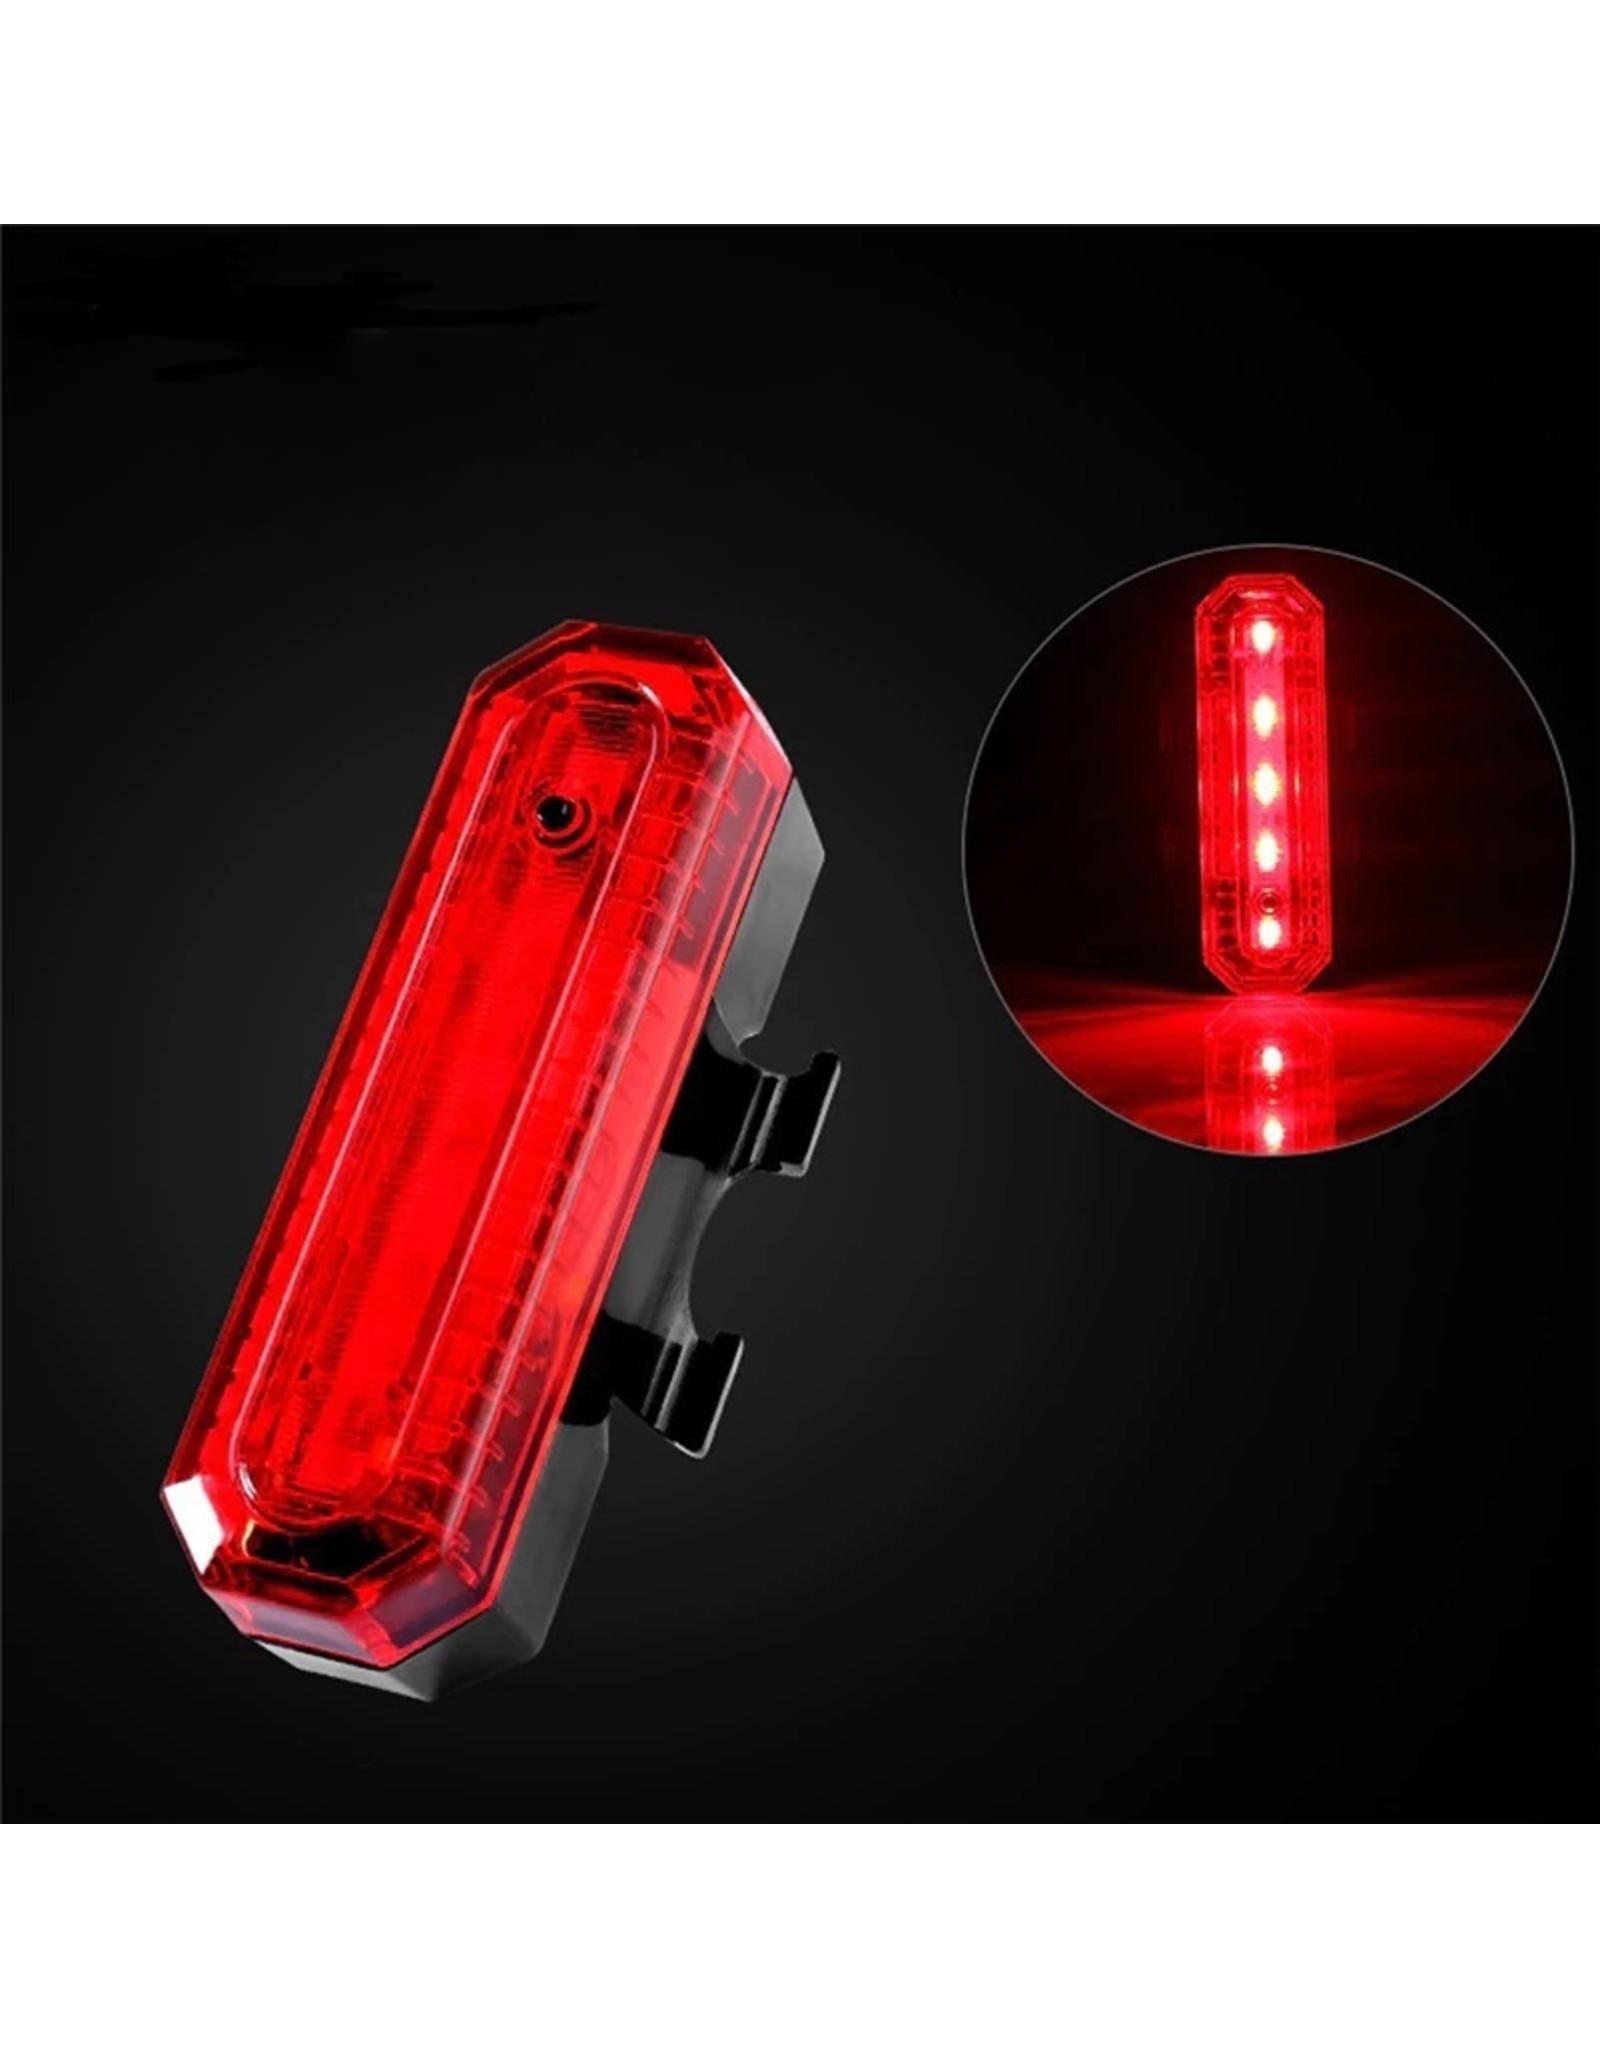 Led Fietslamp – Voorlamp of Achterlamp - USB oplaadbaar